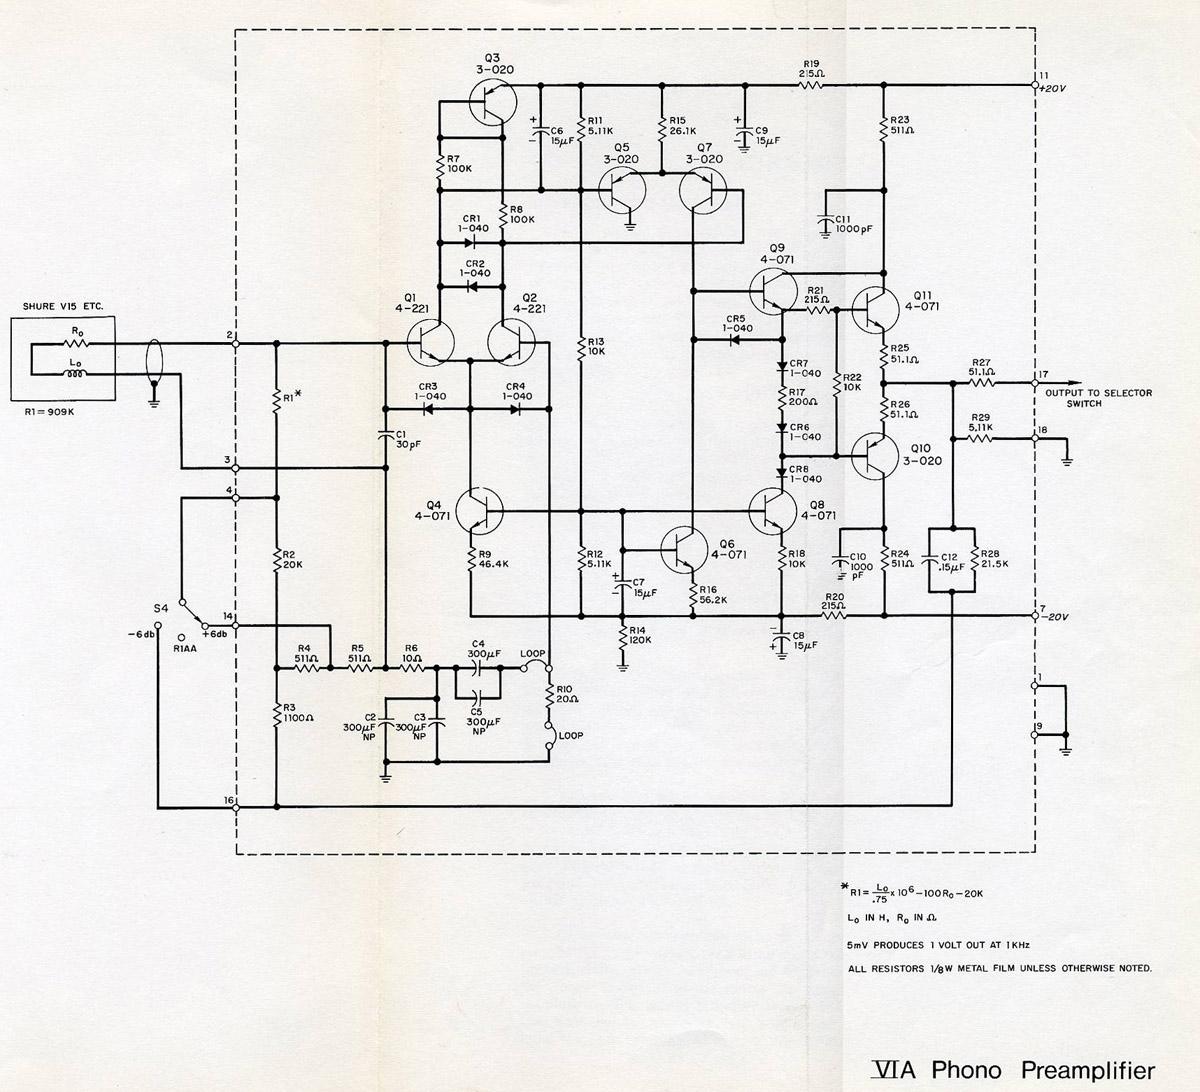 jl audio amp wiring